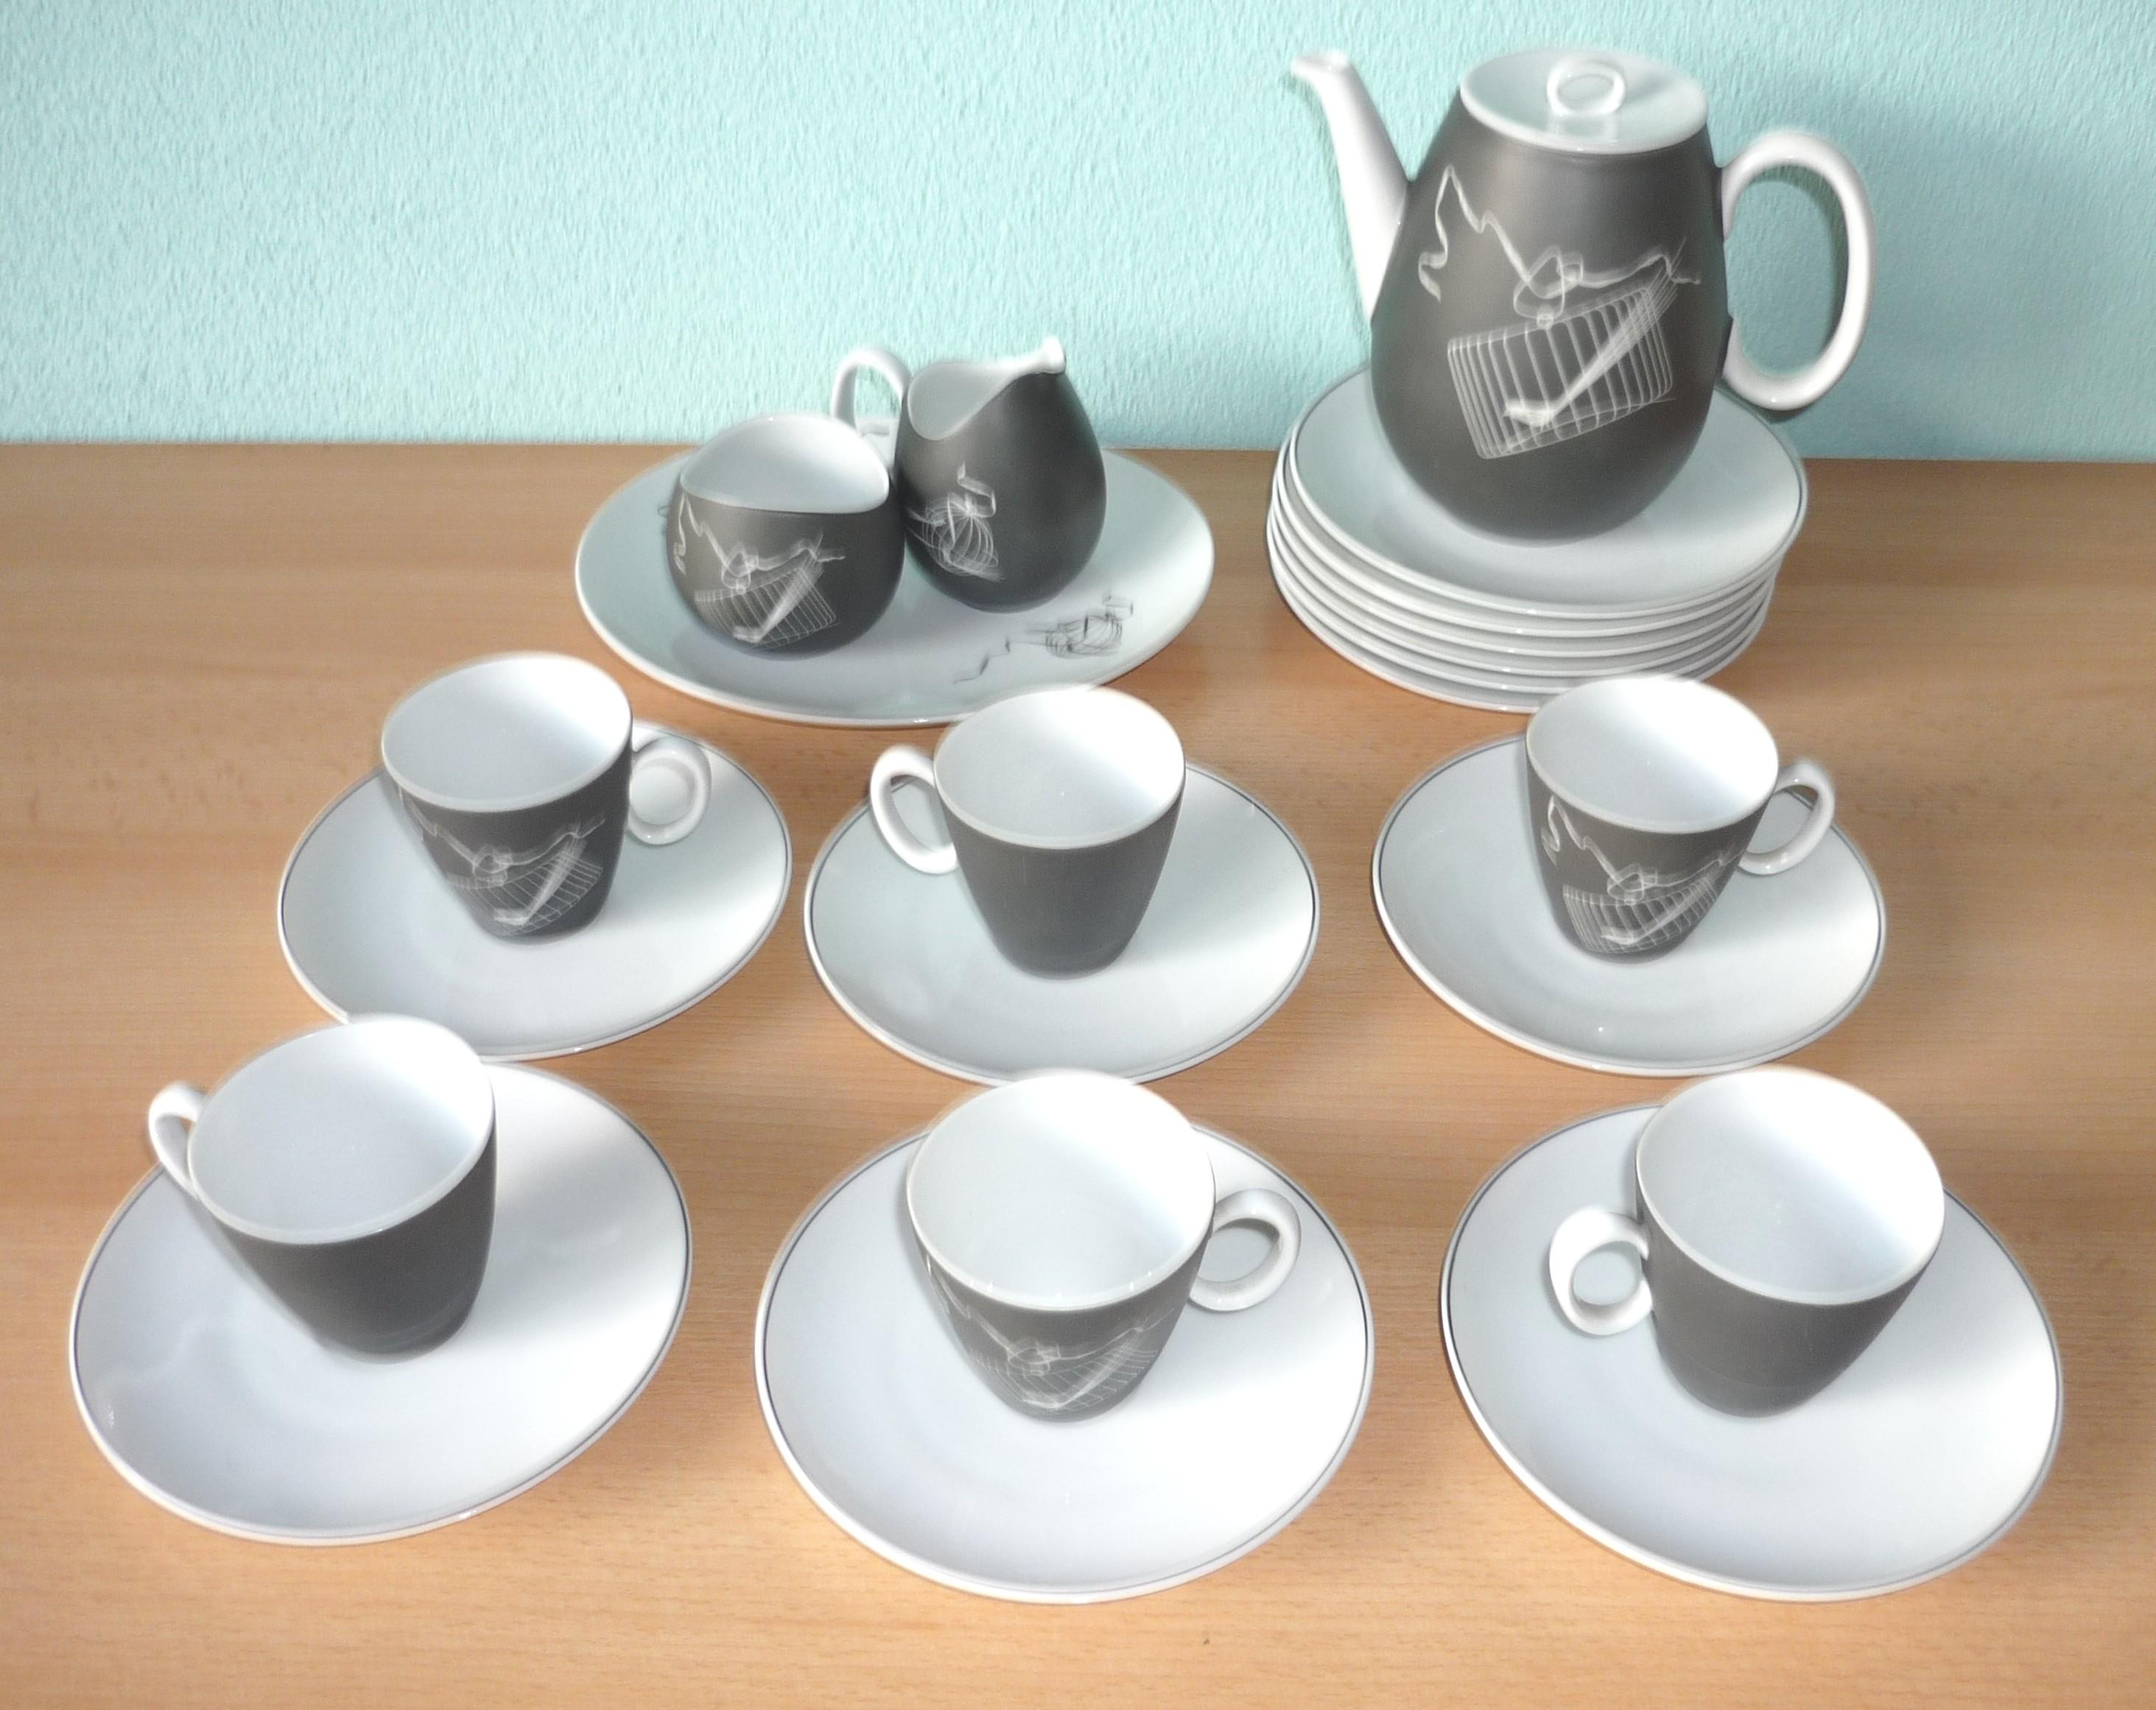 Ceramic Coffee Serving Set Raymond Fernand Loewy 1950s Previous Next